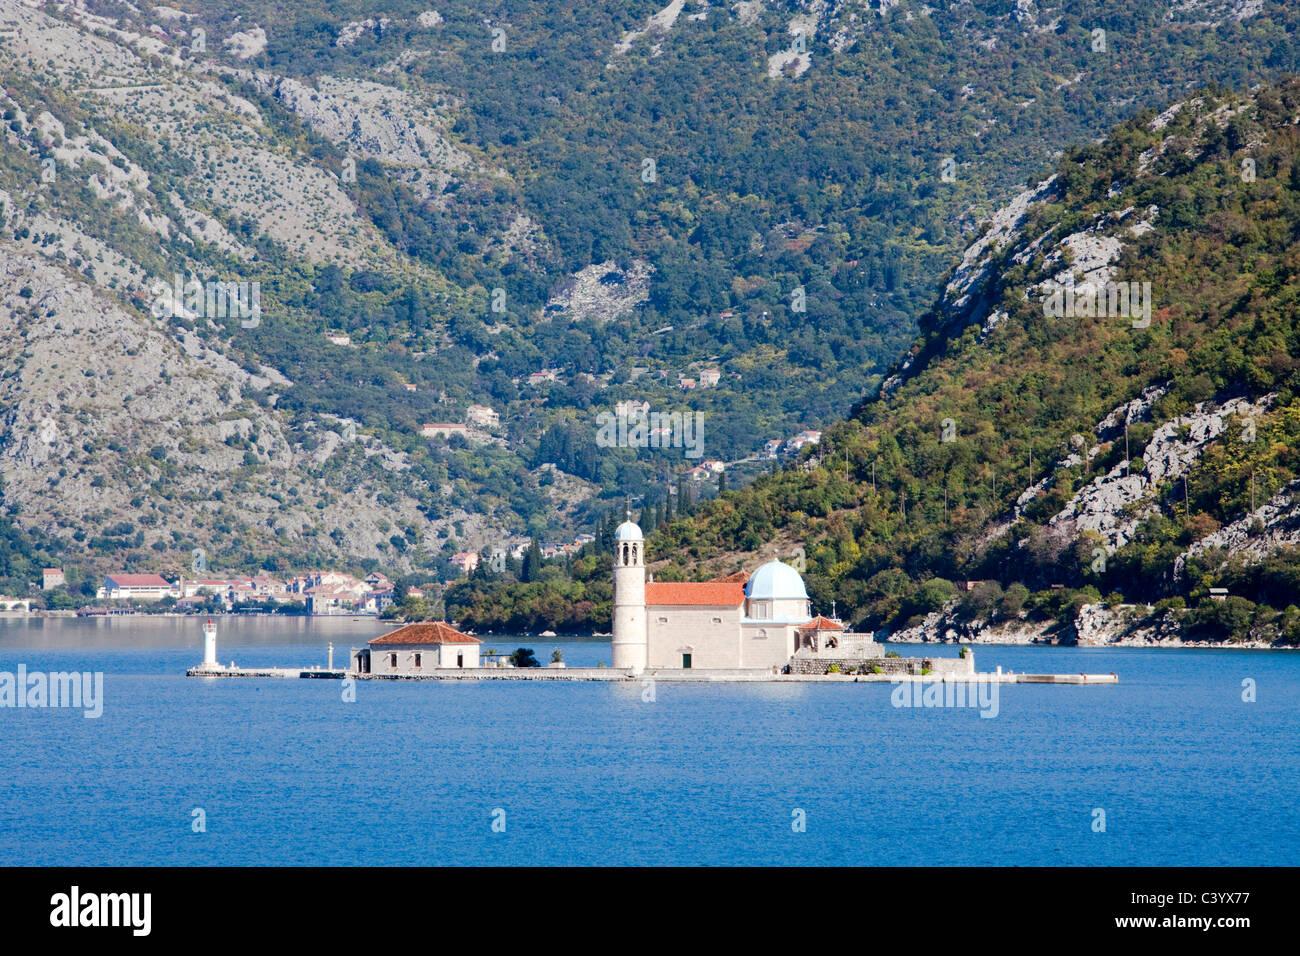 Montenegro, Europe, Adriatic, sea, Perast, island, isle, church, Boka Kotorska, - Stock Image